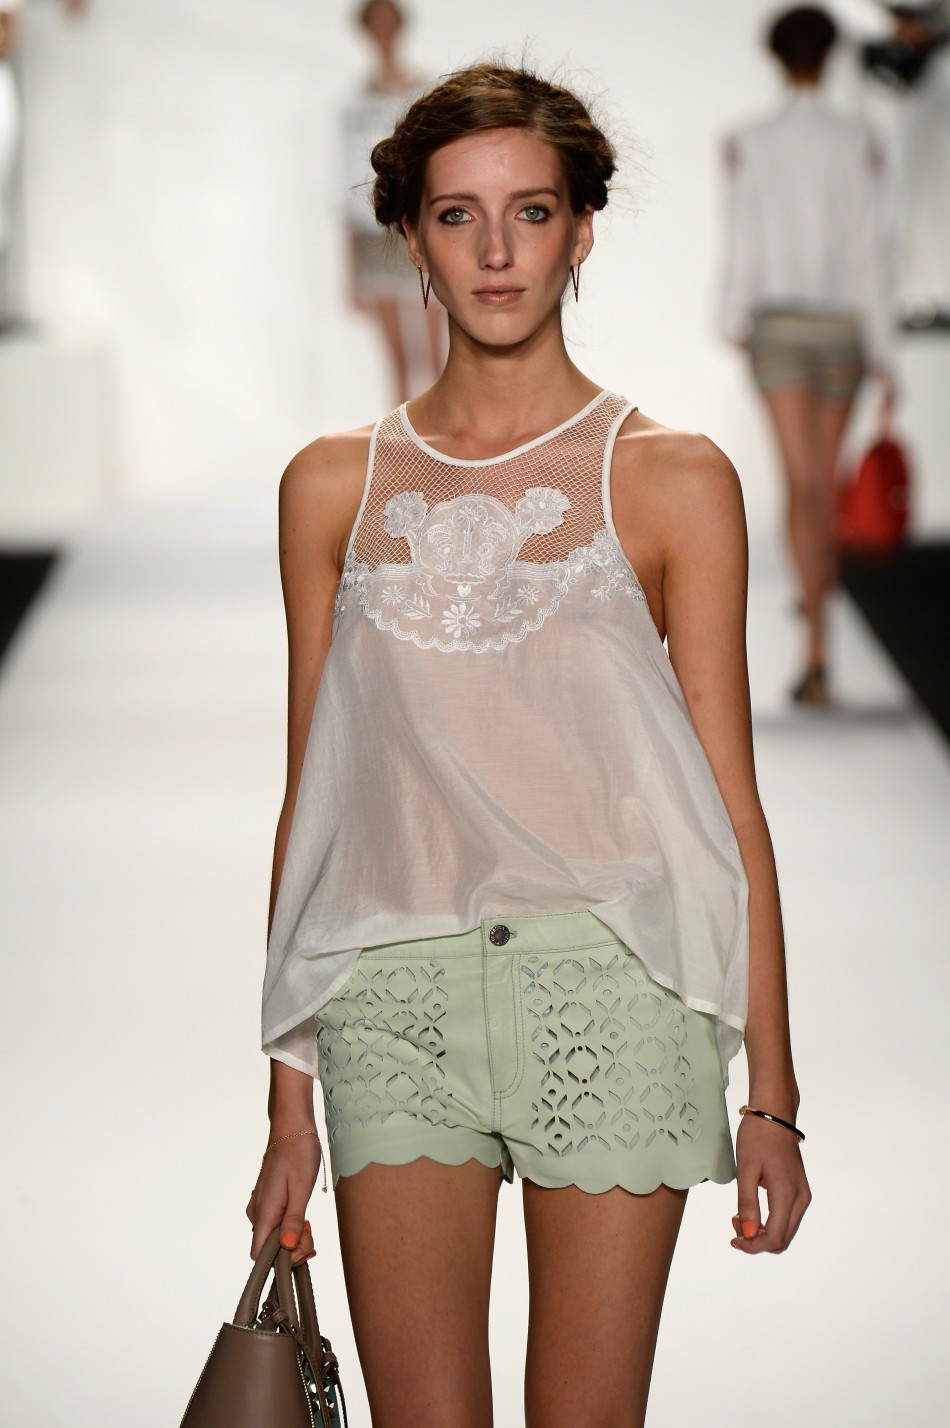 20588-rebecca-minkoff-spring-2014-new-york-fashion-week.jpg